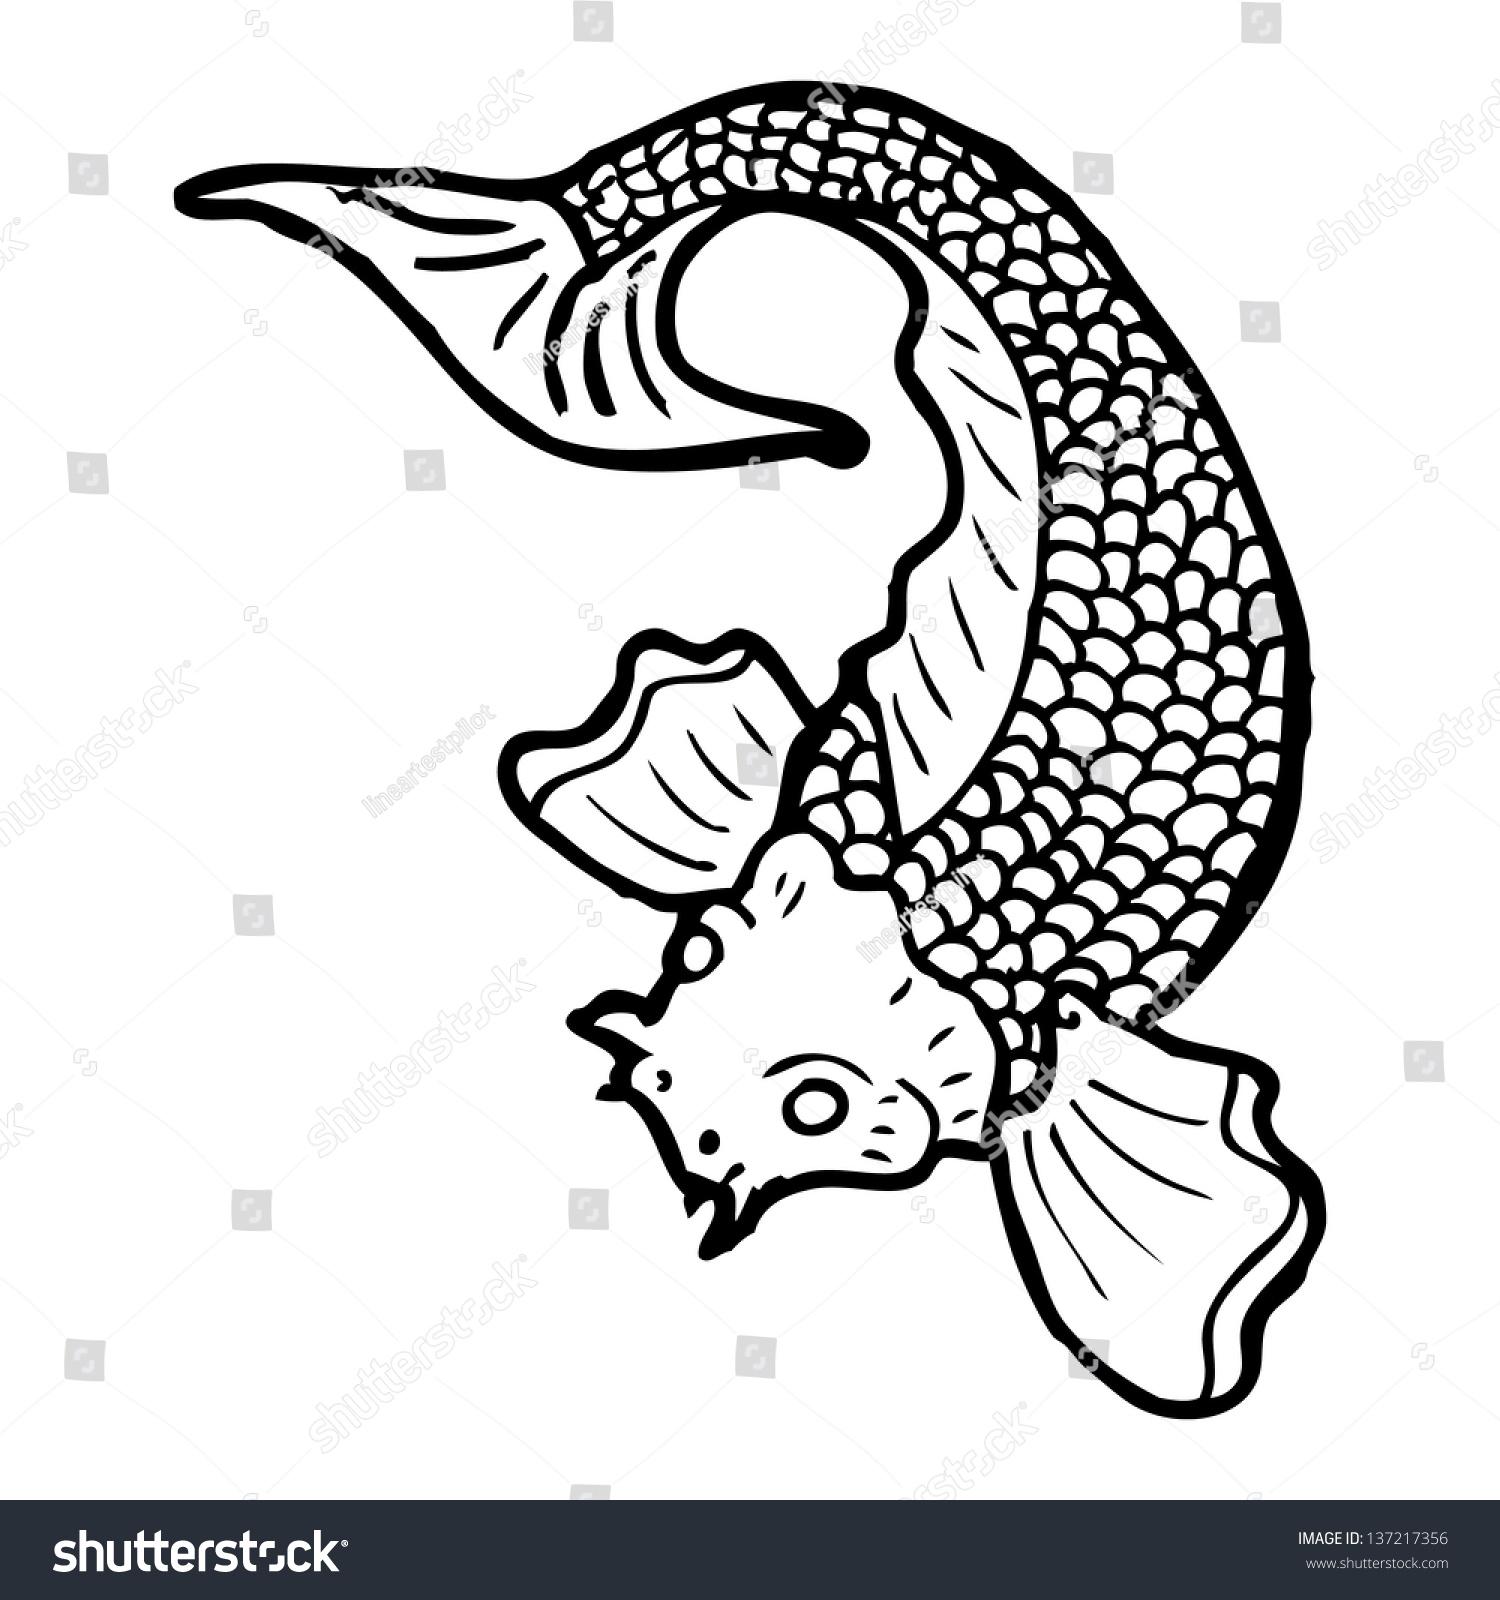 black white japanese fish tattoo stock illustration 137217356 shutterstock. Black Bedroom Furniture Sets. Home Design Ideas